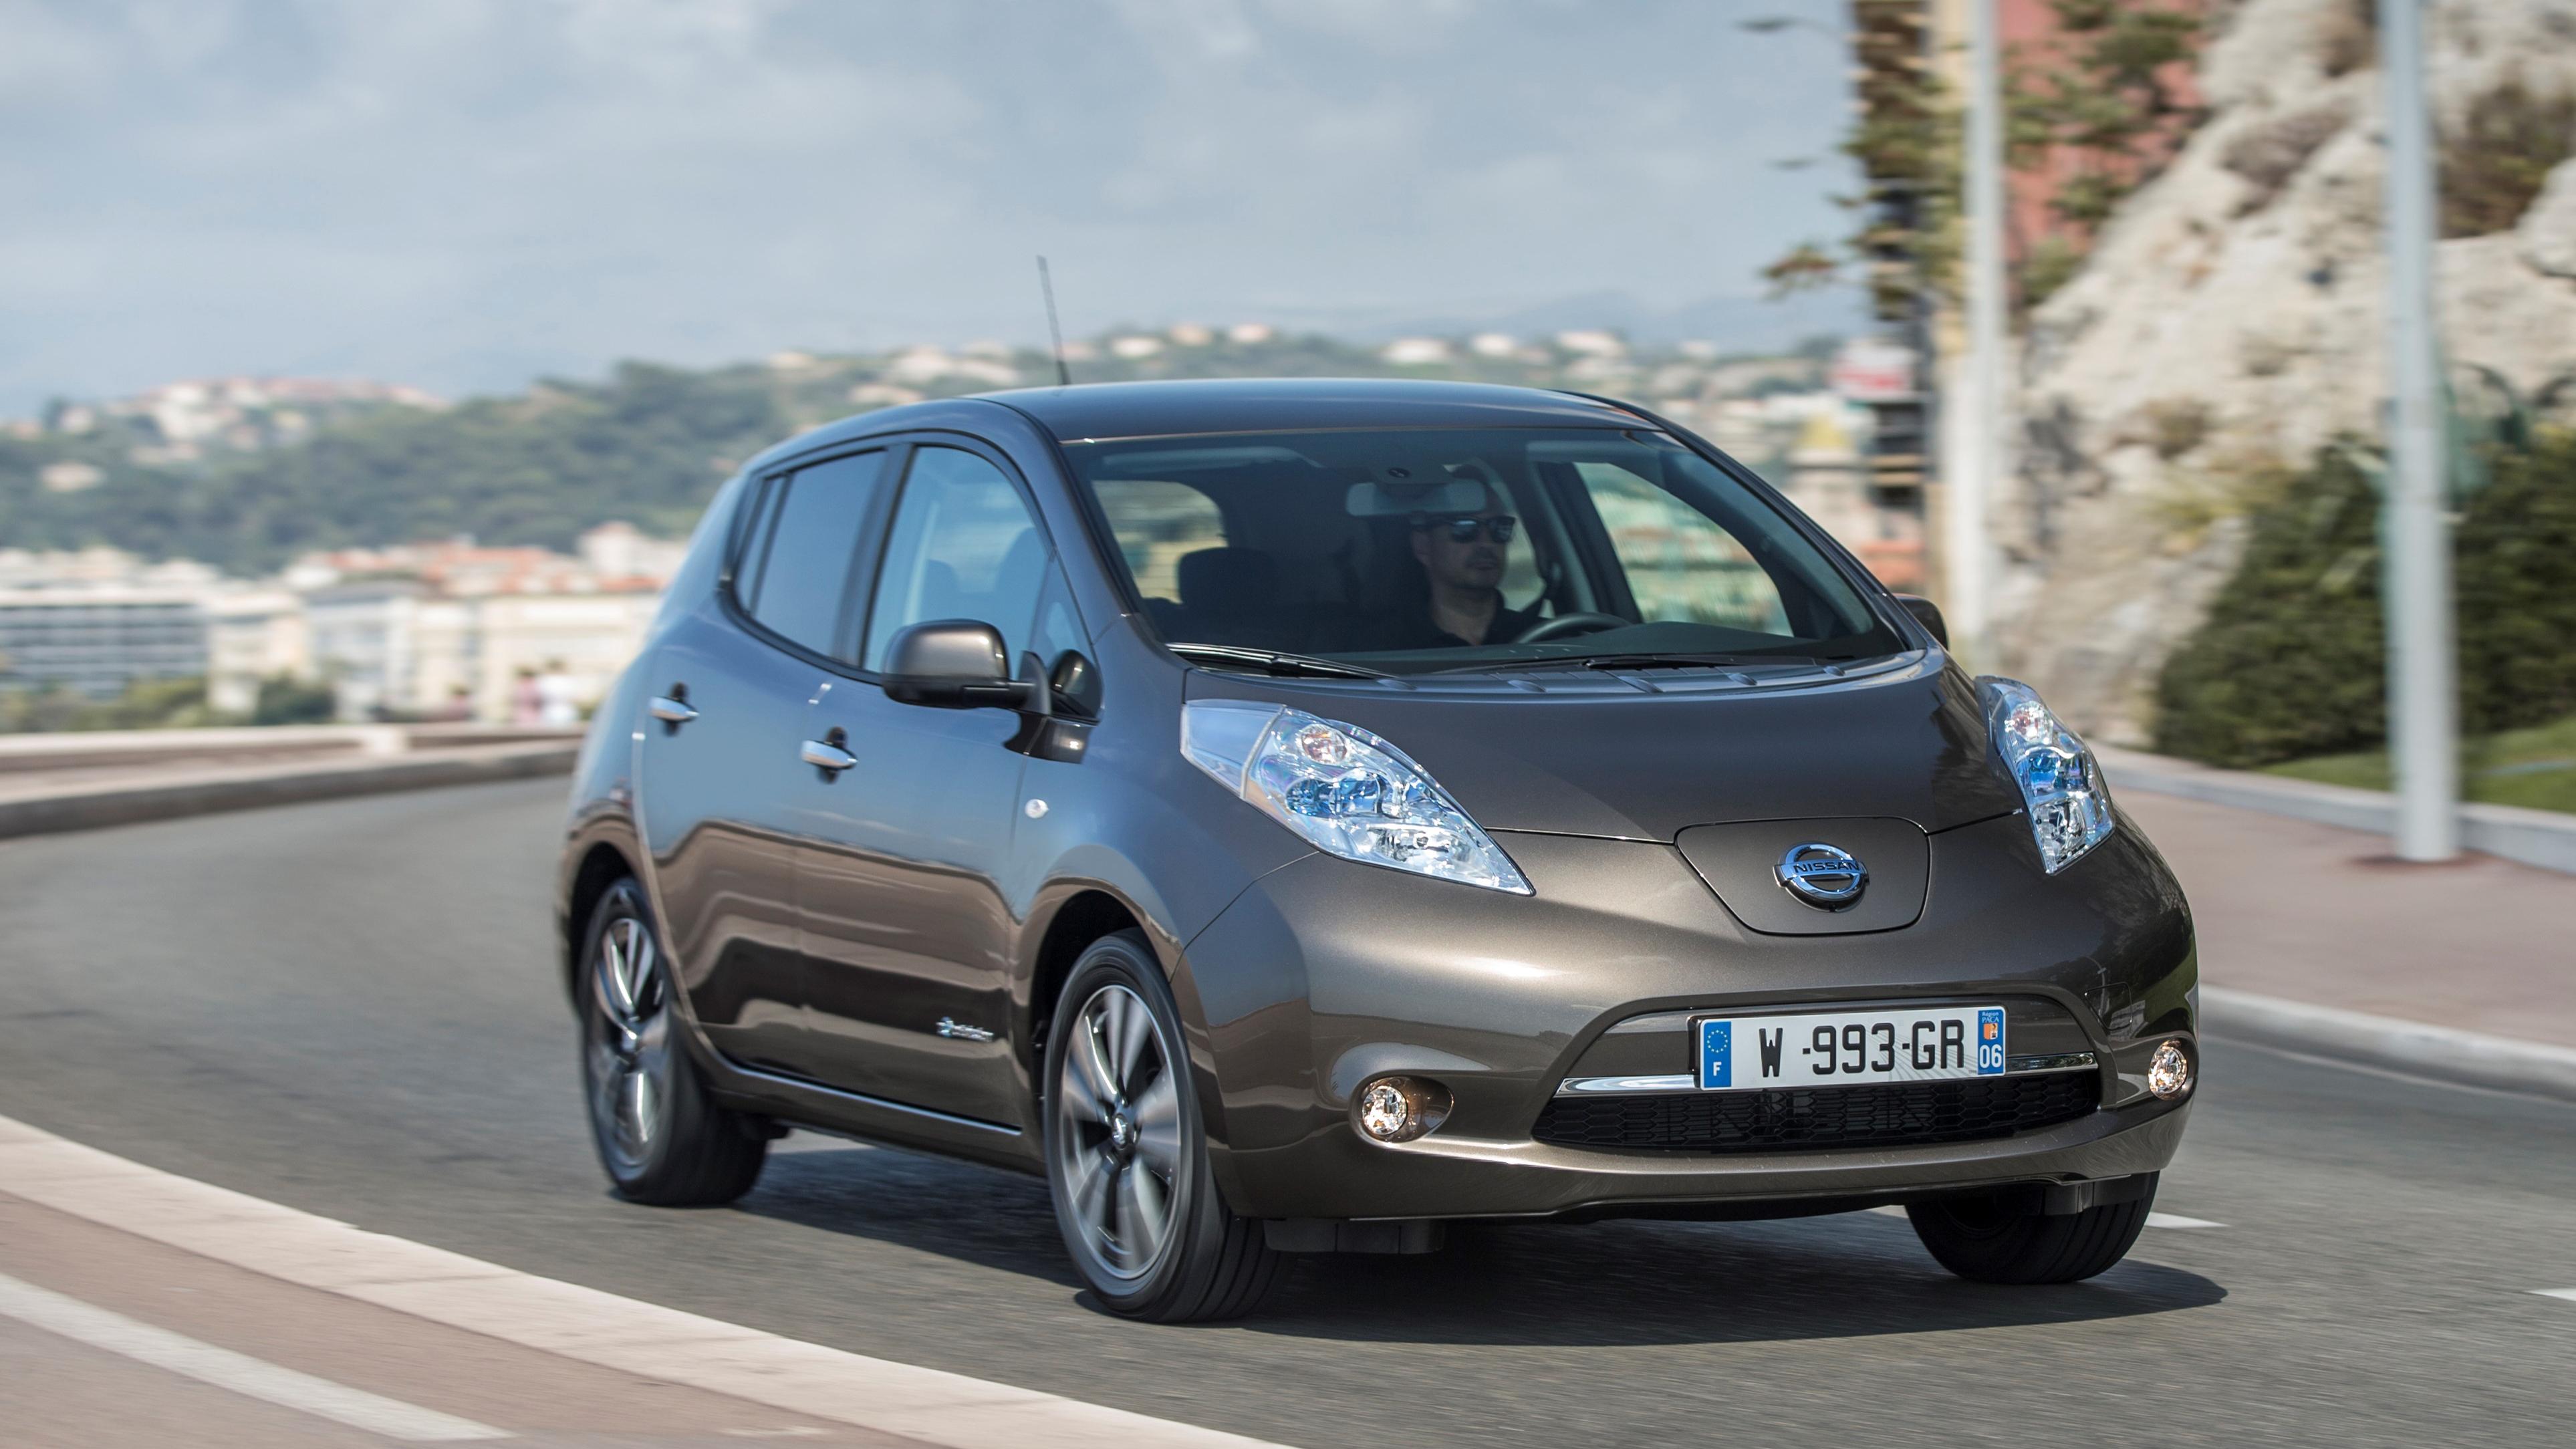 Nissan Leaf 30 kWh (2016)